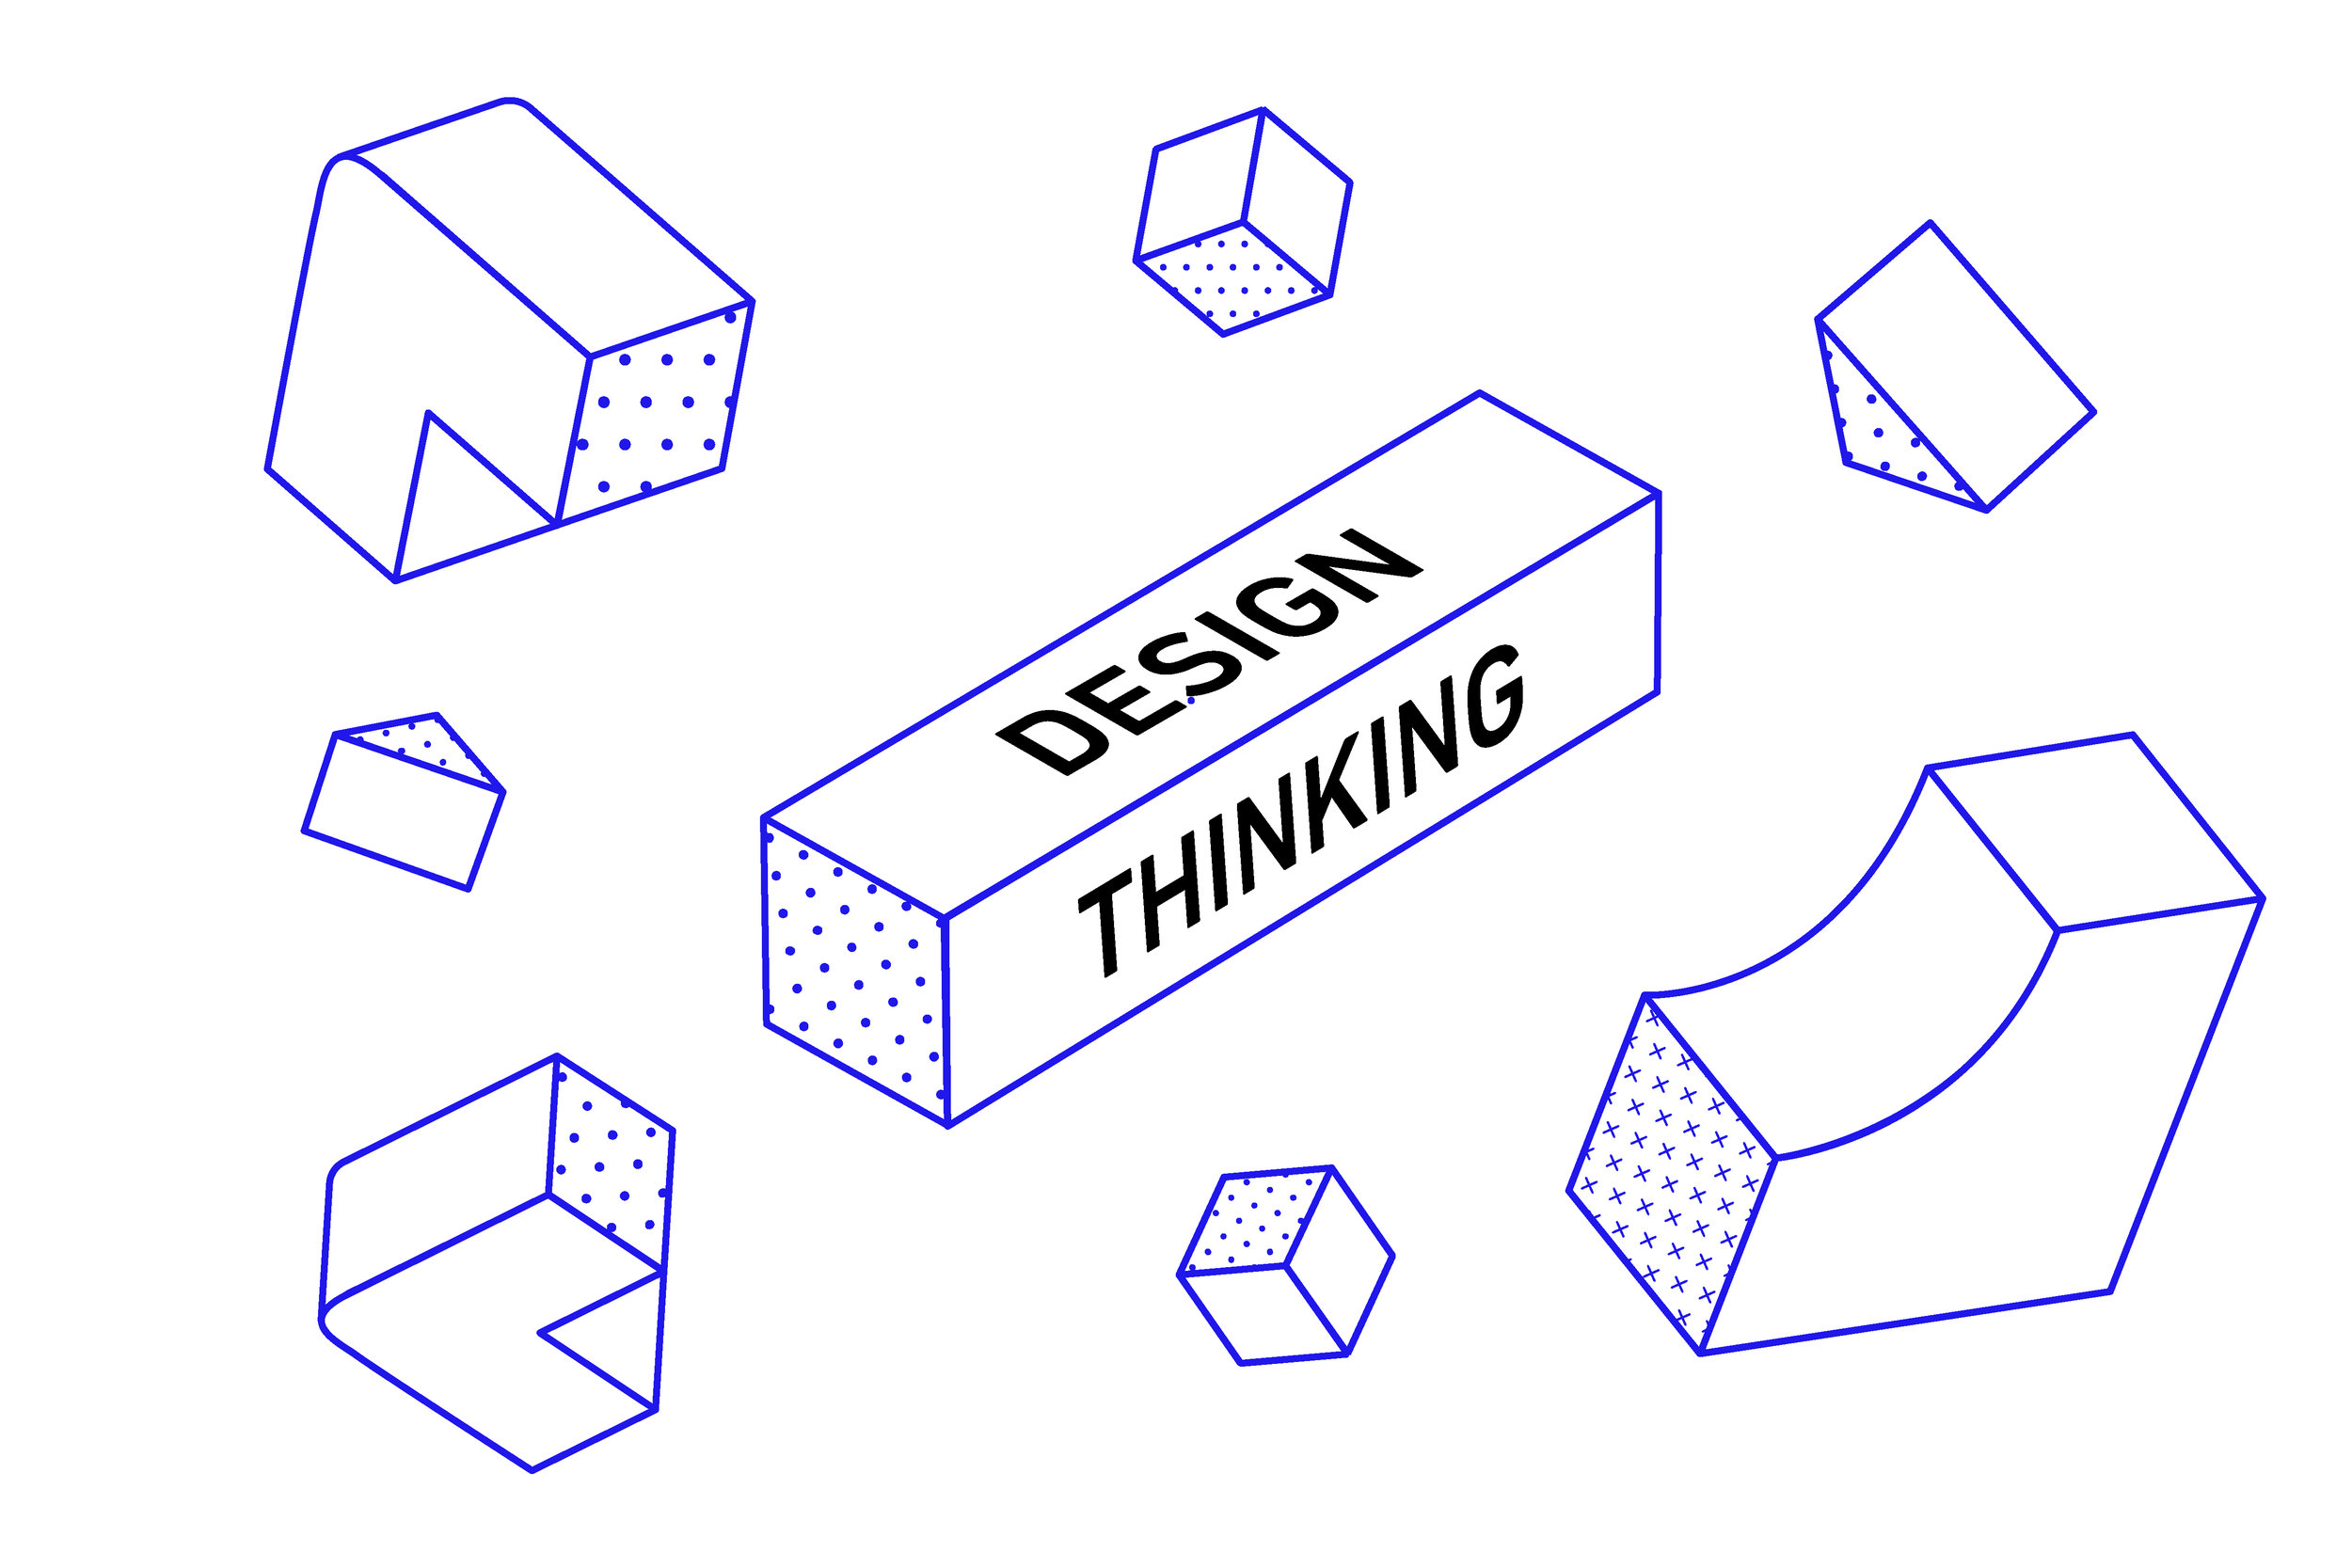 MDW_DESIGNTHINKING.jpg